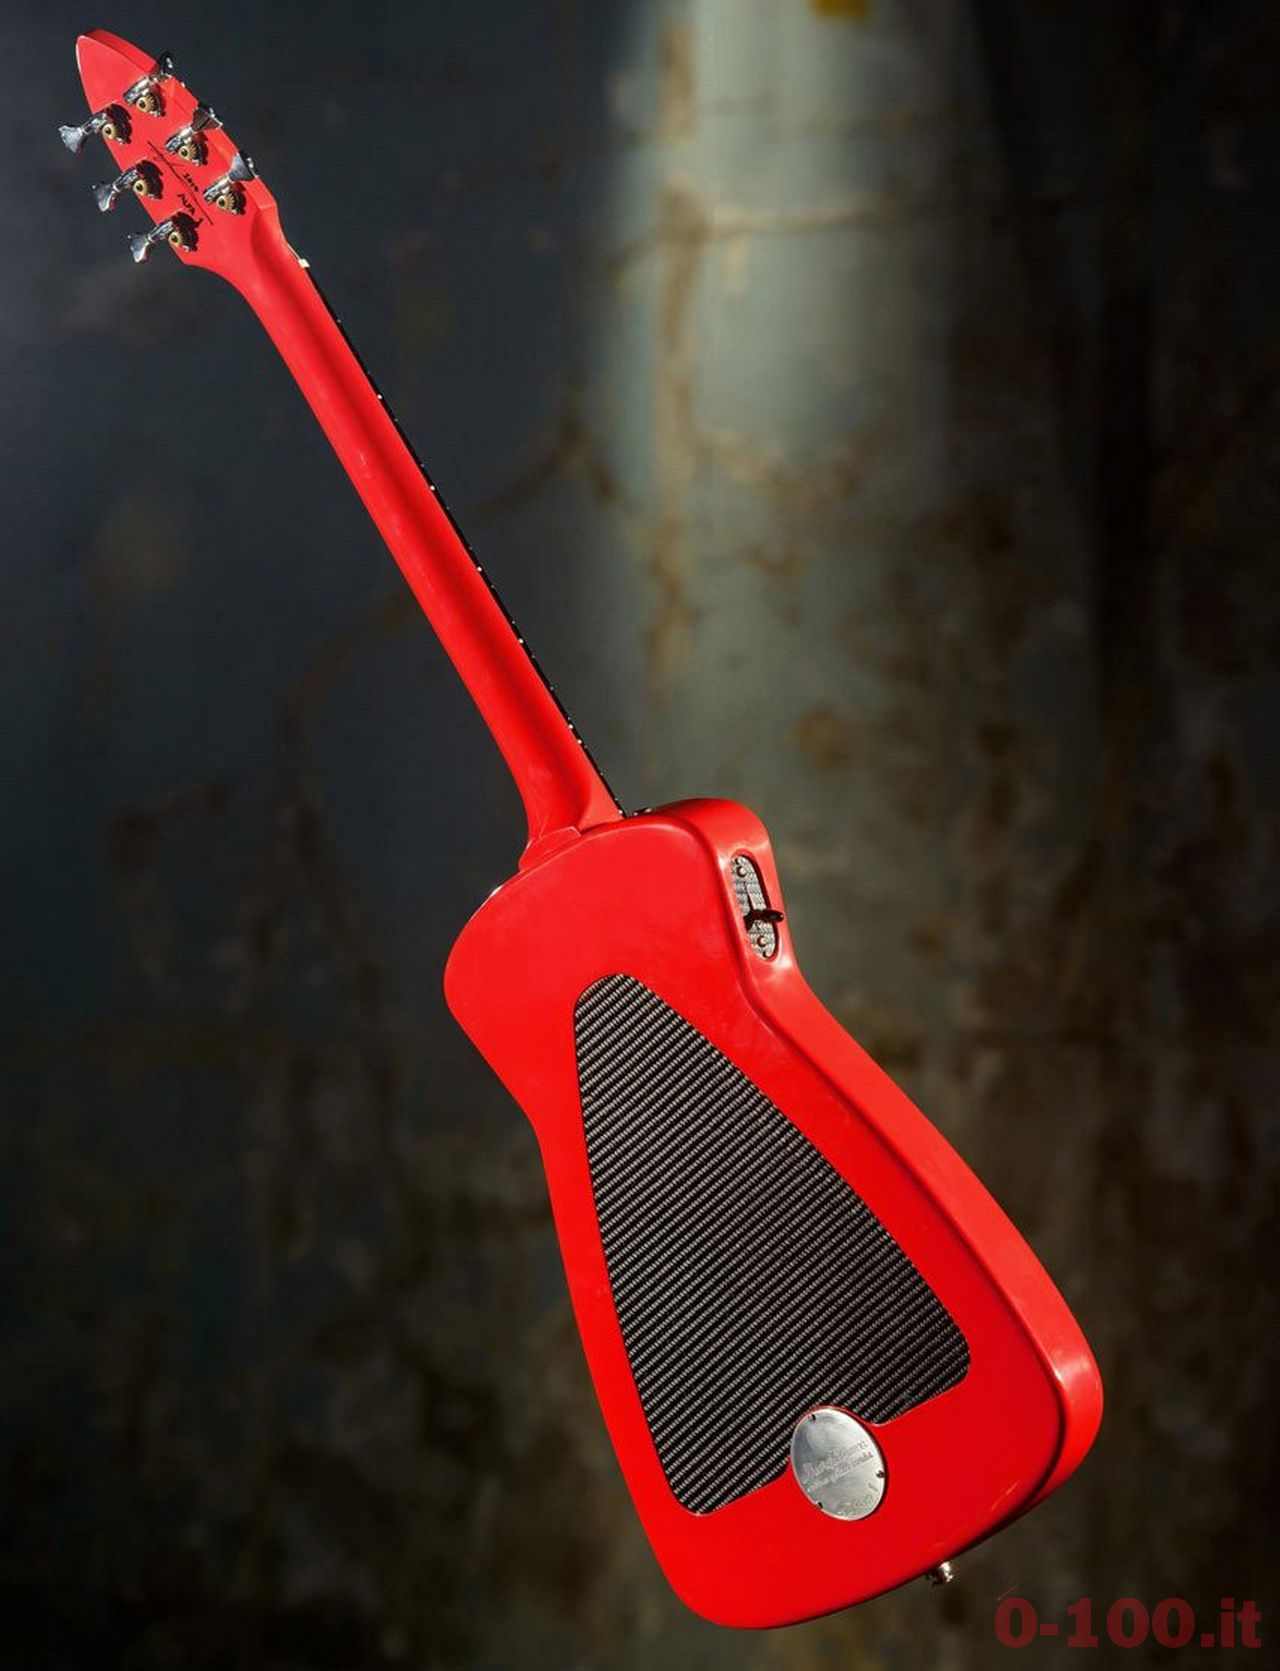 alfa-romeo-guitar-harrison-custom-guitar-works-104-anni-biscione_0-1004